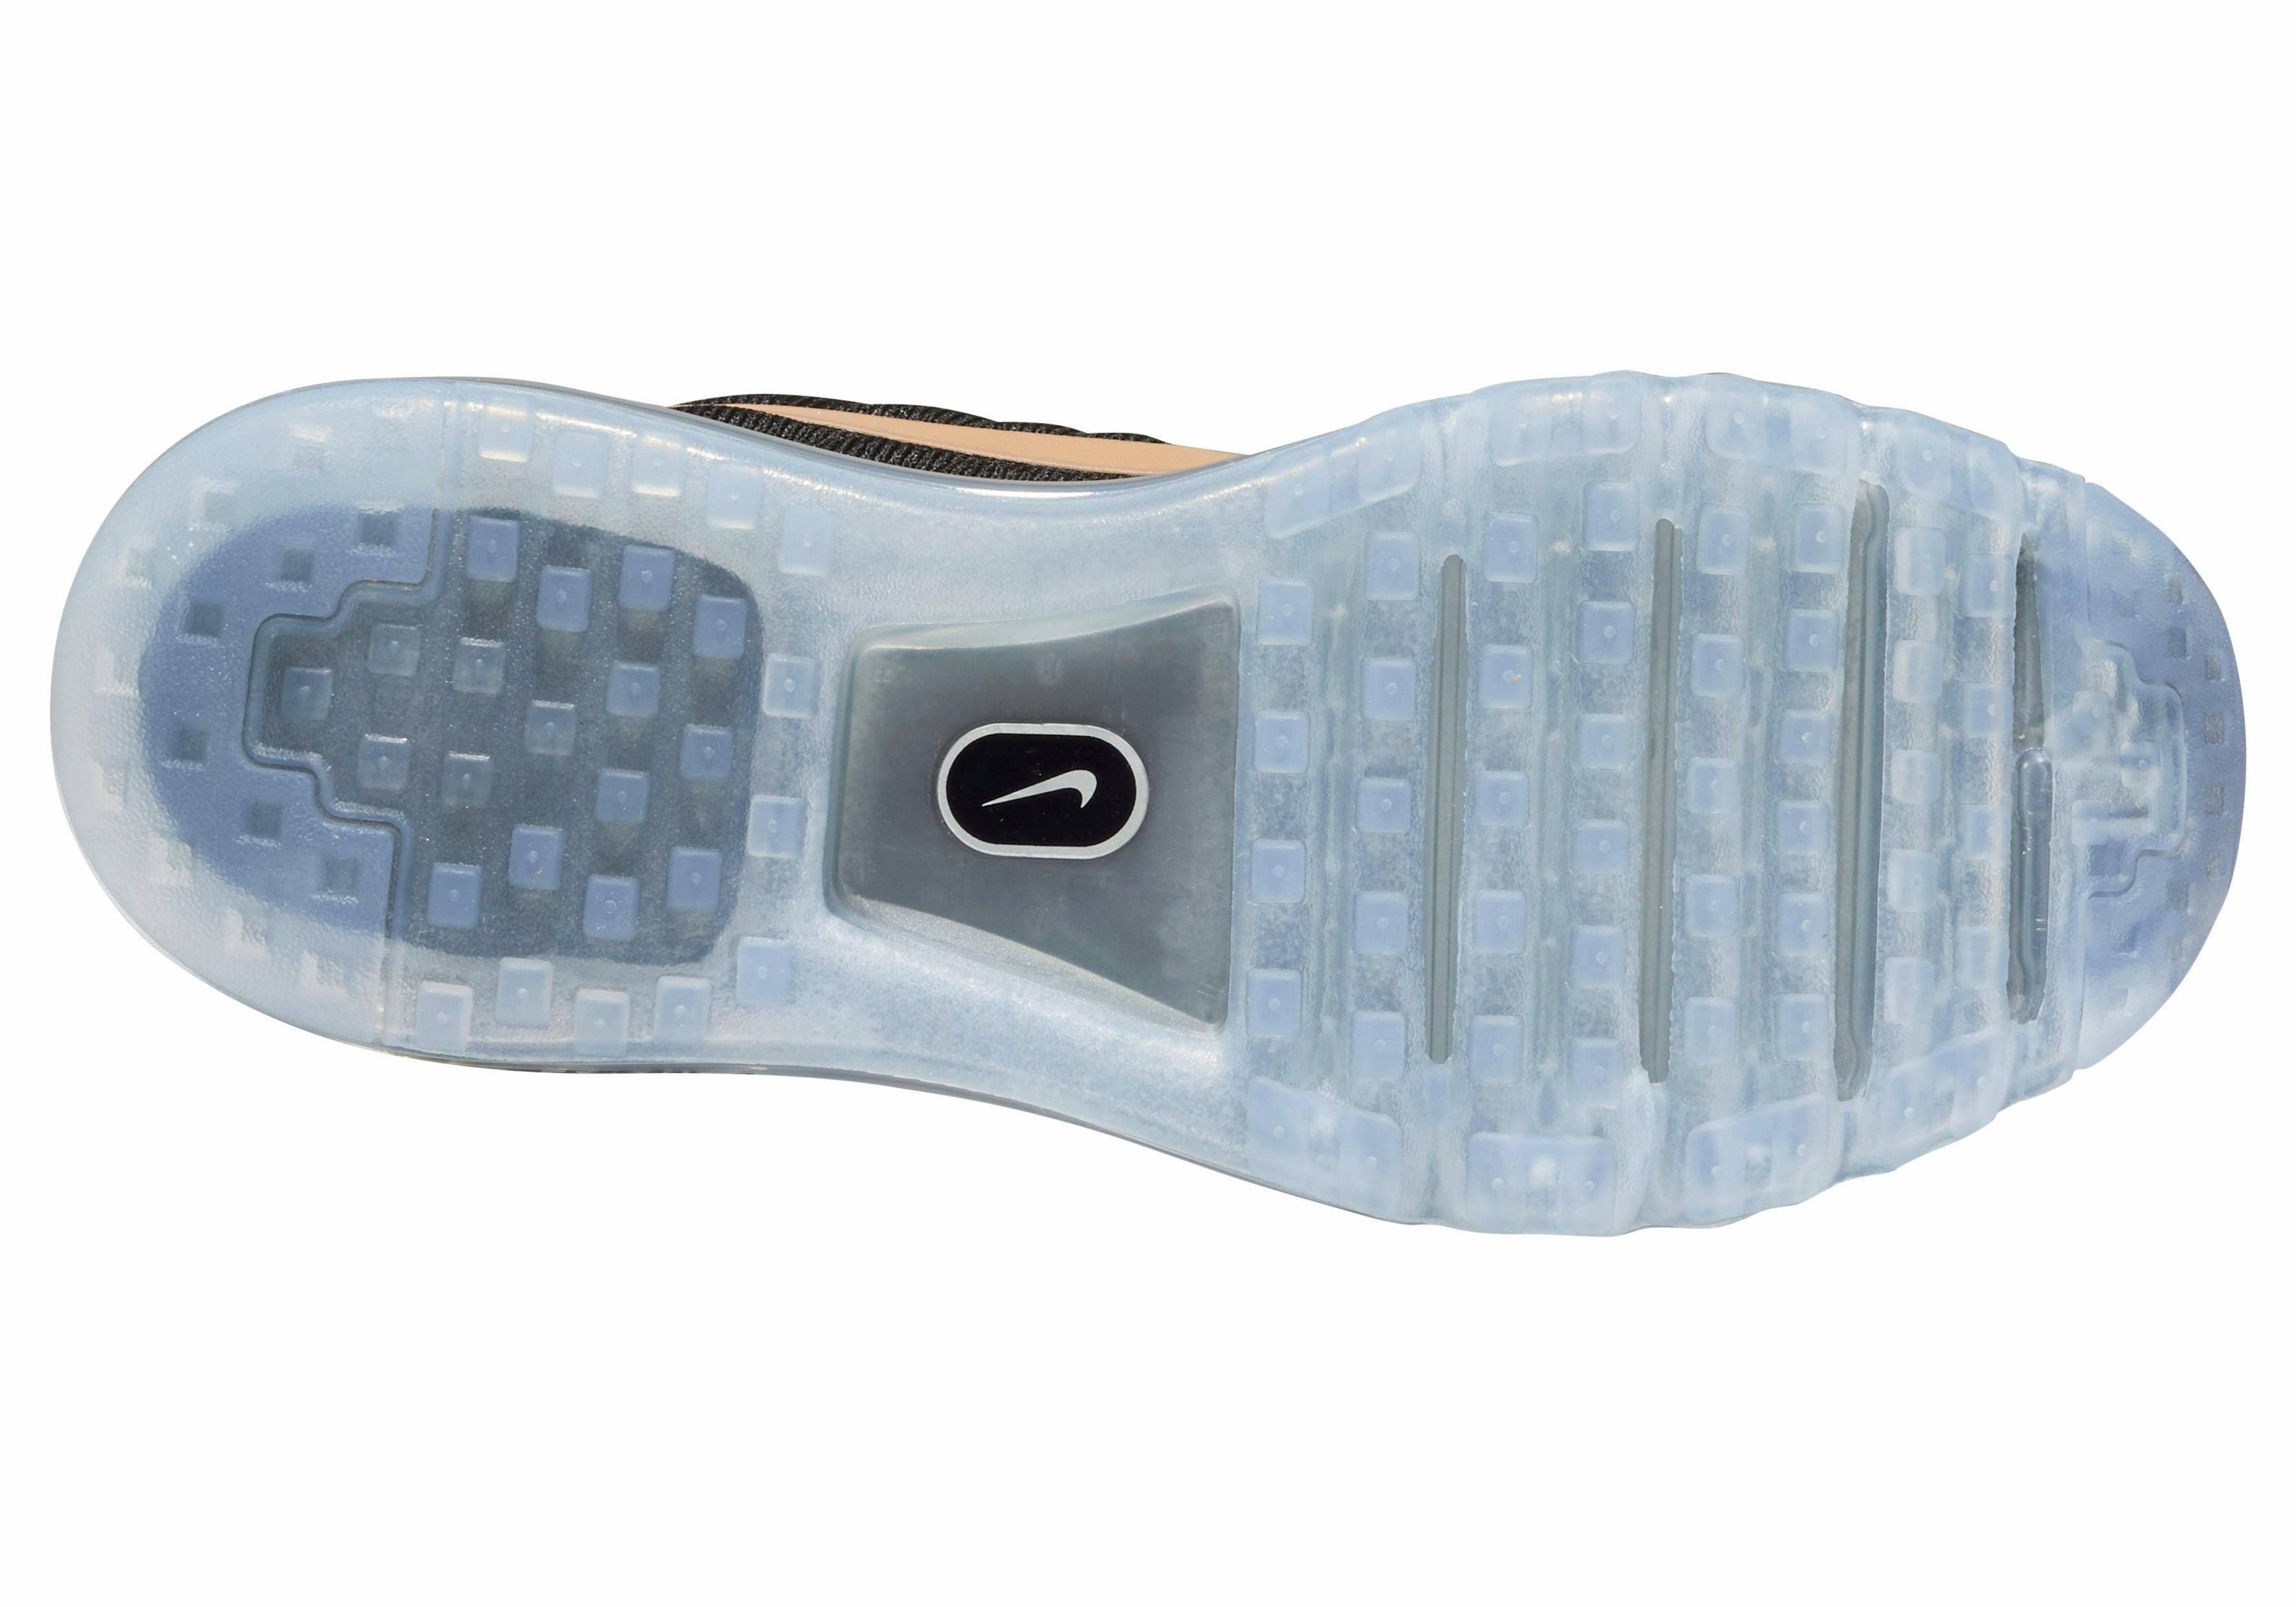 Nike 2017 roségoldfarben Max Straße Frau Schwarz Shoe Sportschuhe Air Running Fußbekleidung ZrZP4